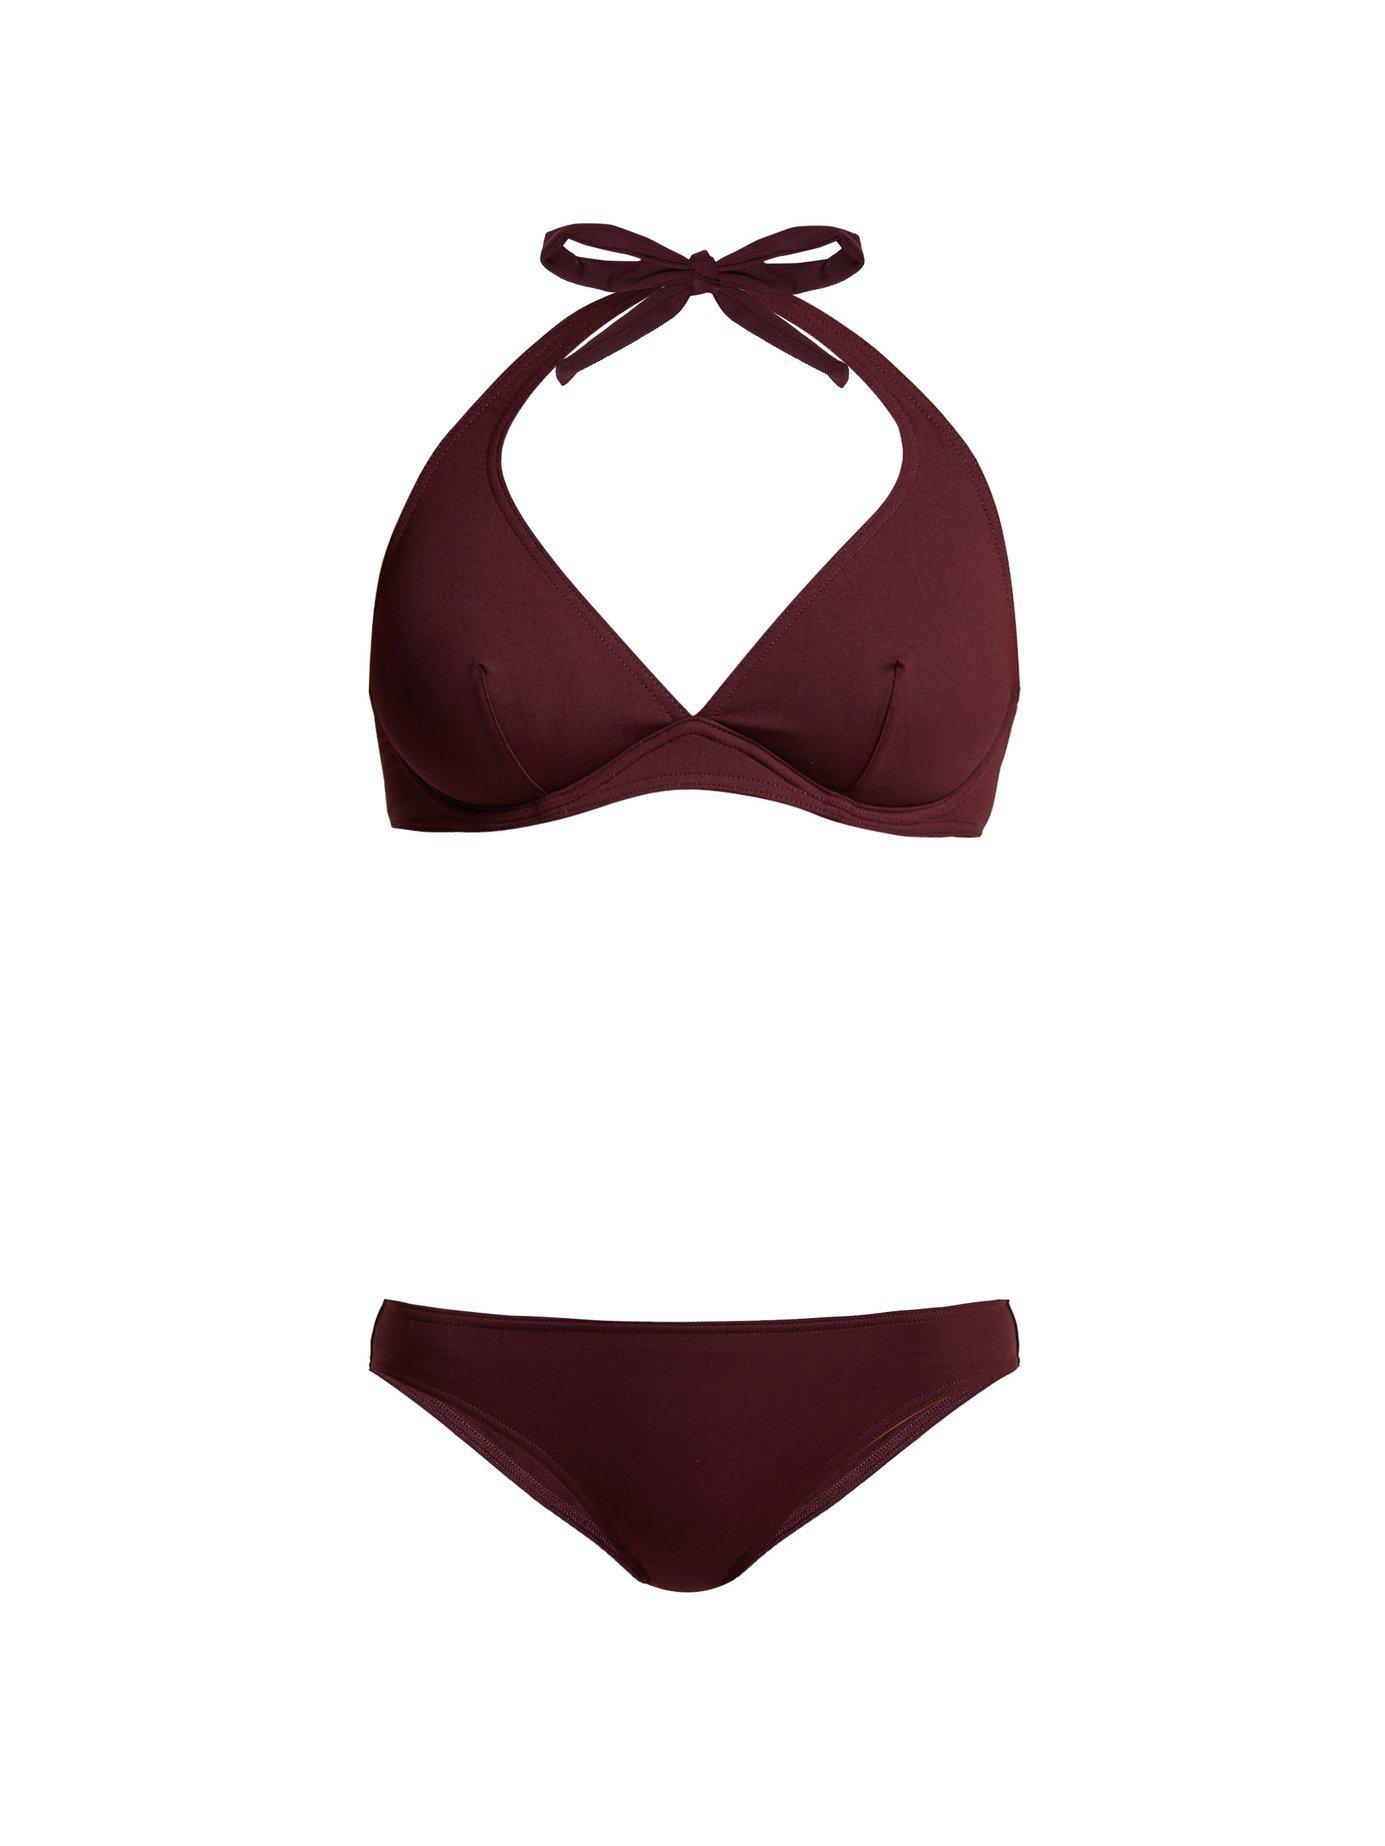 409d121330 Lyst - Eres Bandito   Scarlett Bikini in Red